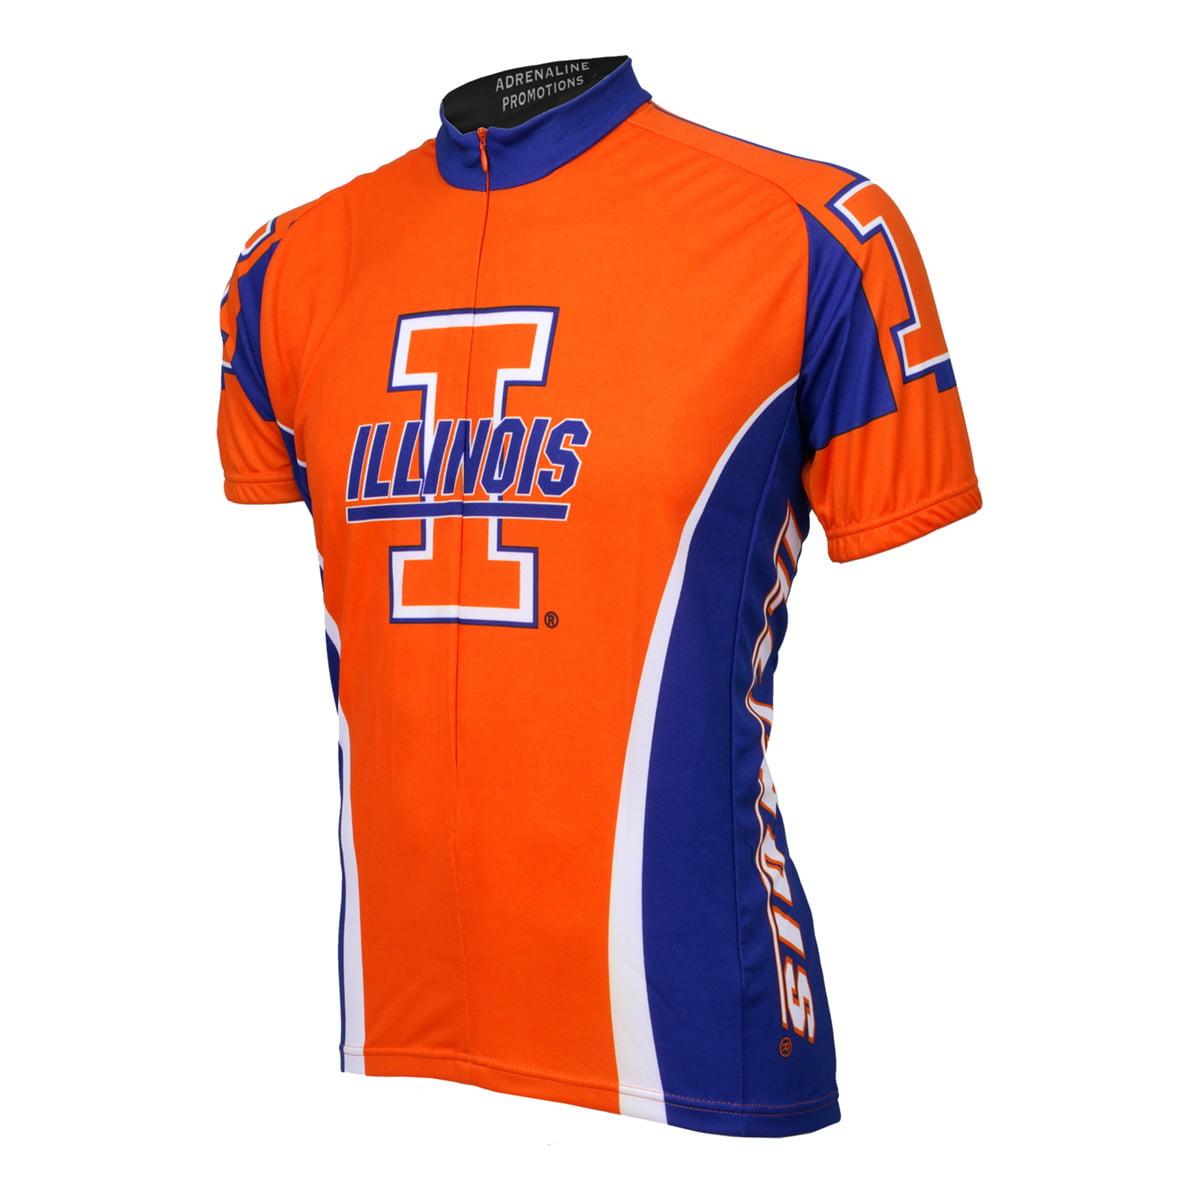 Adrenaline Promotions University of Illinois Cycling Jersey